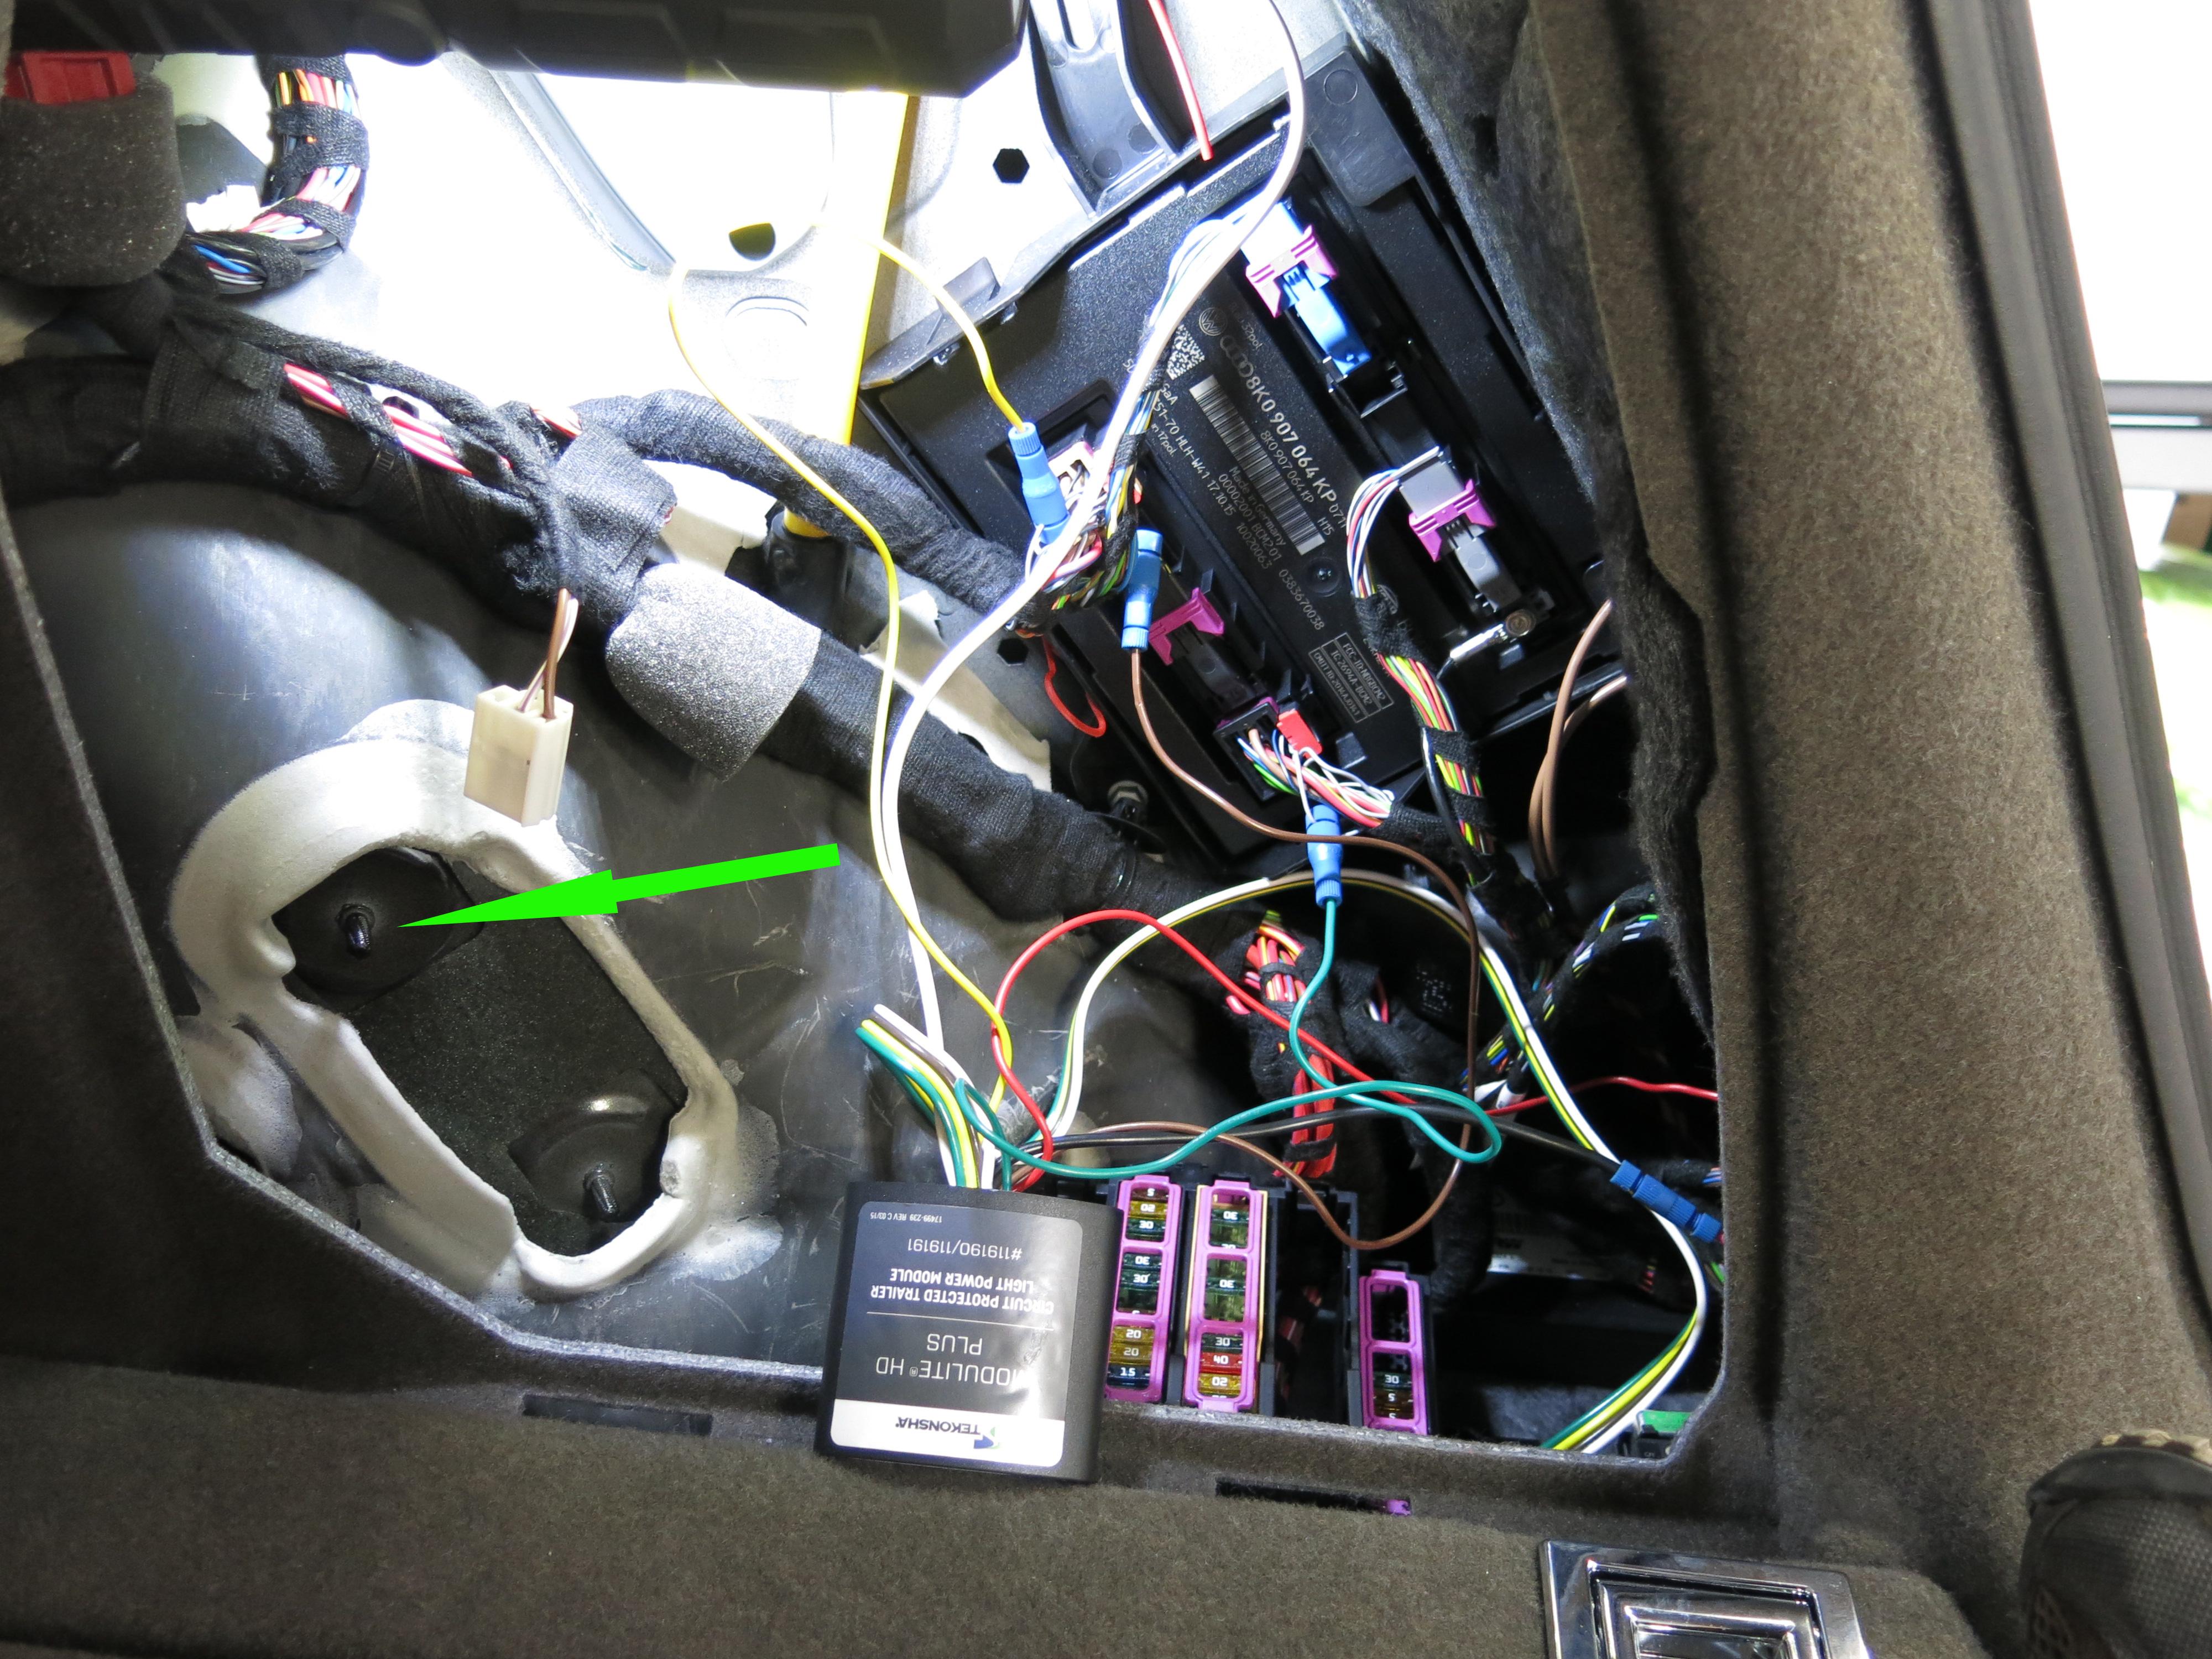 Audi Q7 Towbar Wiring Diagram - Marinco 50 Wiring Diagram Free Picture  Schematic - bathroom-vents.yenpancane.jeanjaures37.fr   Audi Q7 Towbar Wiring Diagram      Wiring Diagram Resource